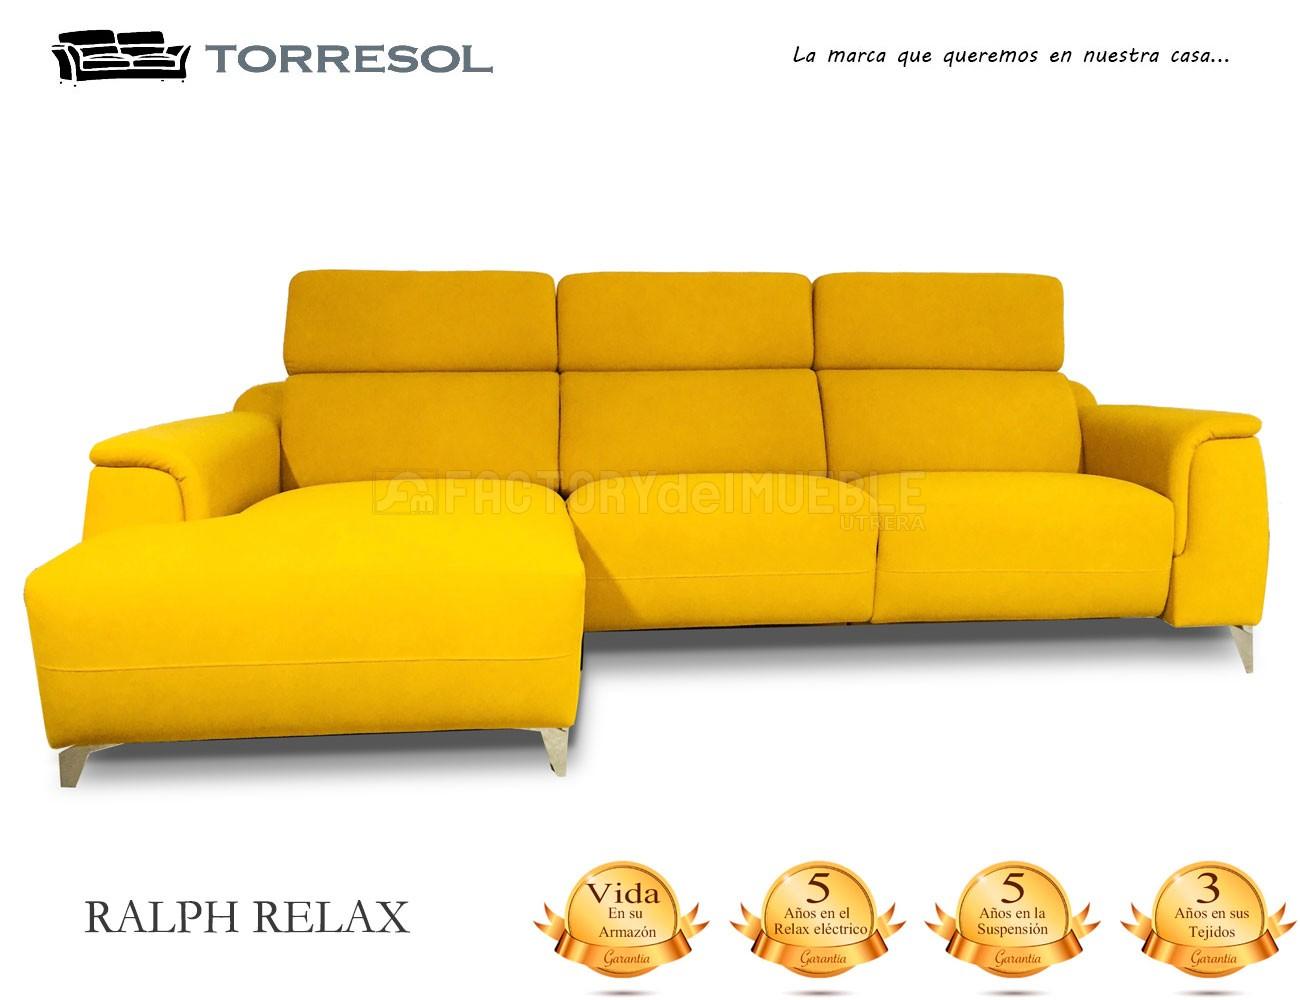 Sofa ralph torresol1